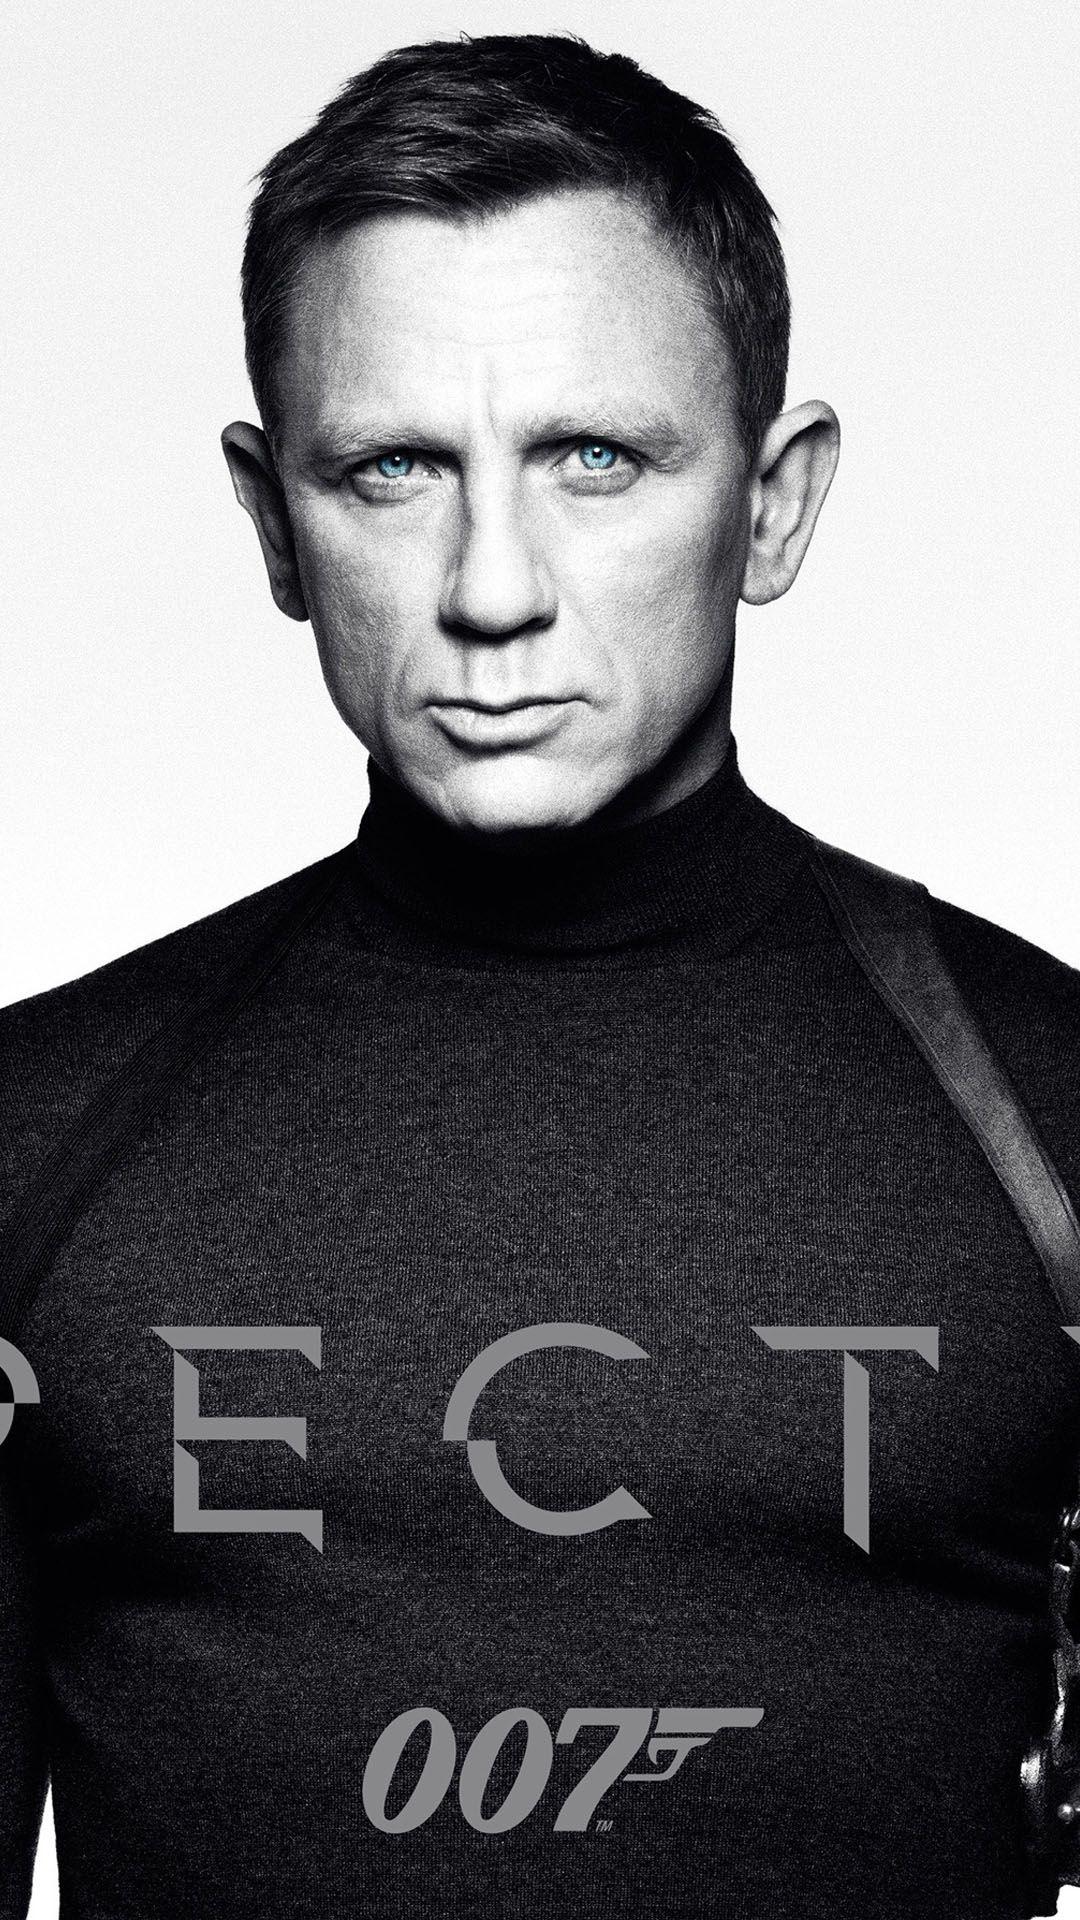 Skyfall Retina Wallpaper in Bond James Bond Series iPhone